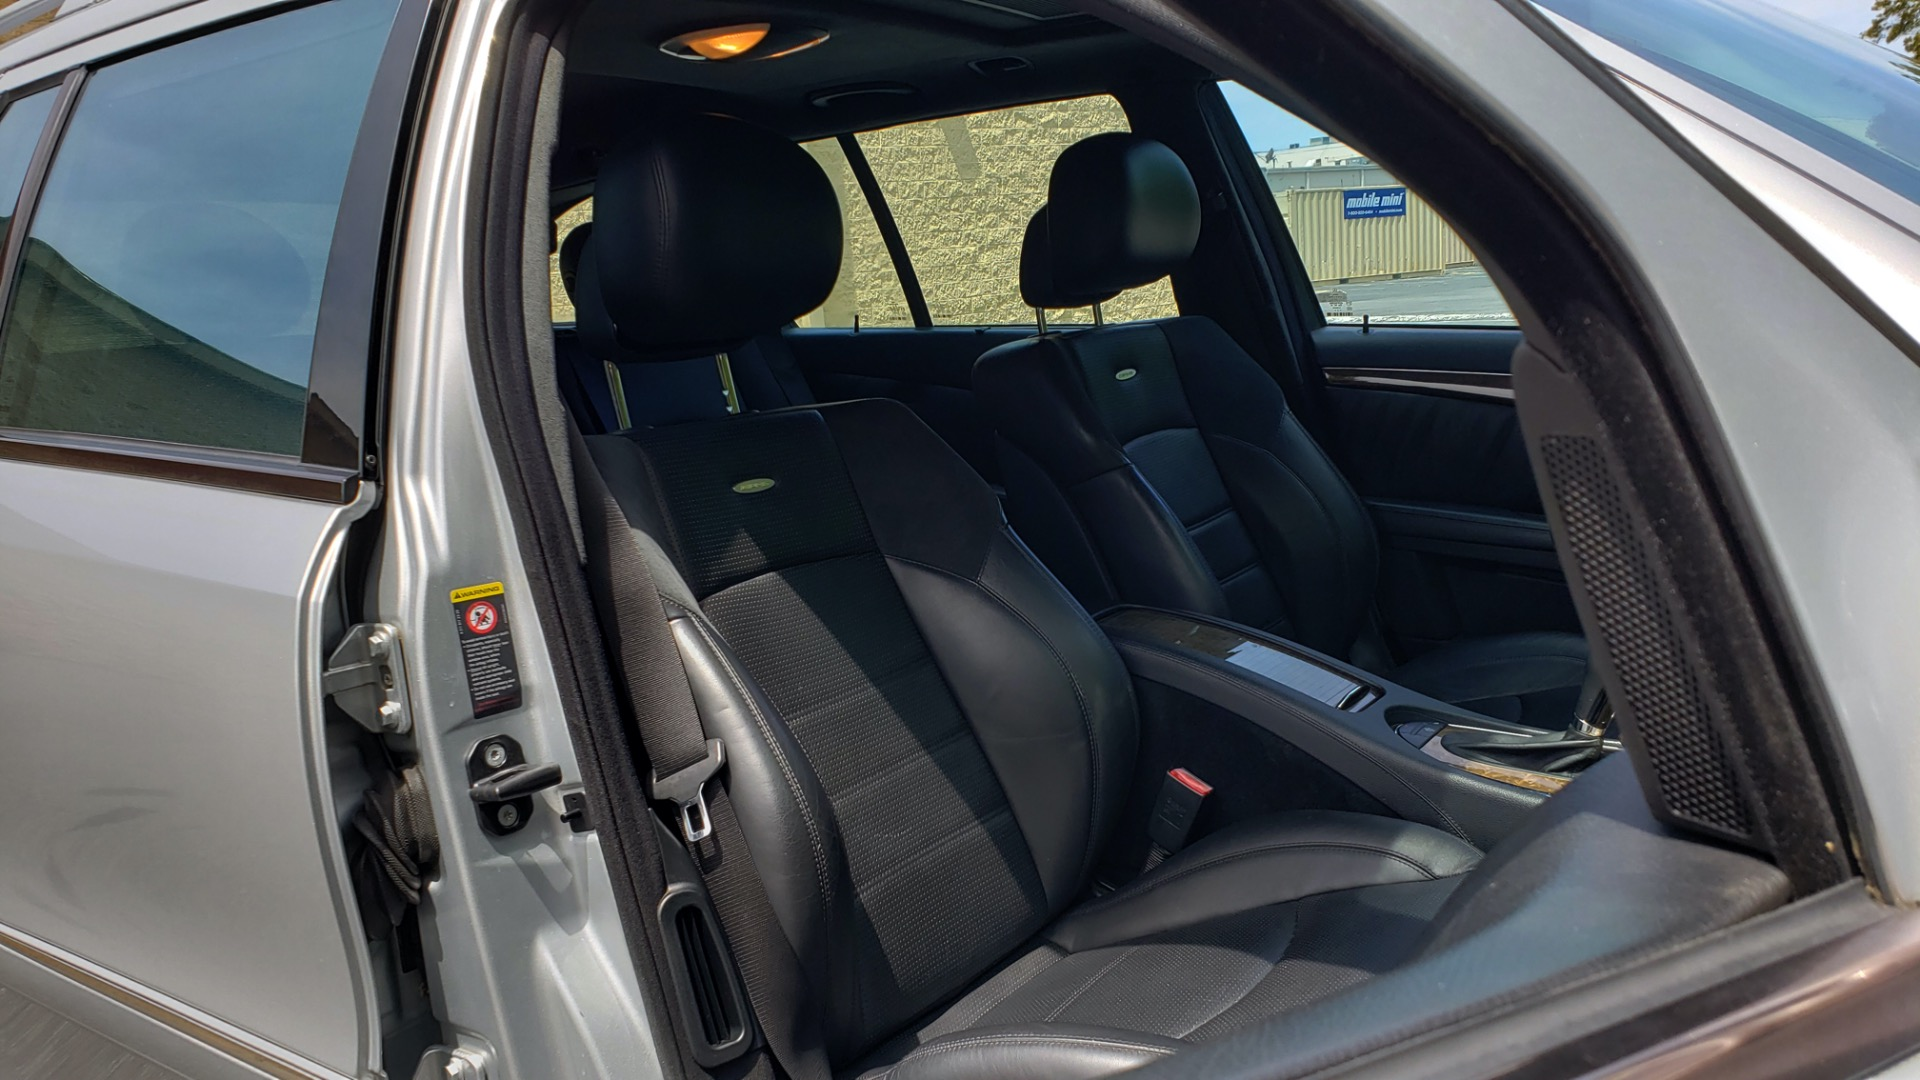 Used 2007 Mercedes-Benz E-Class E63 AMG WAGON / NAV / SUNROOF / HARMAN/KARDON for sale $29,000 at Formula Imports in Charlotte NC 28227 72